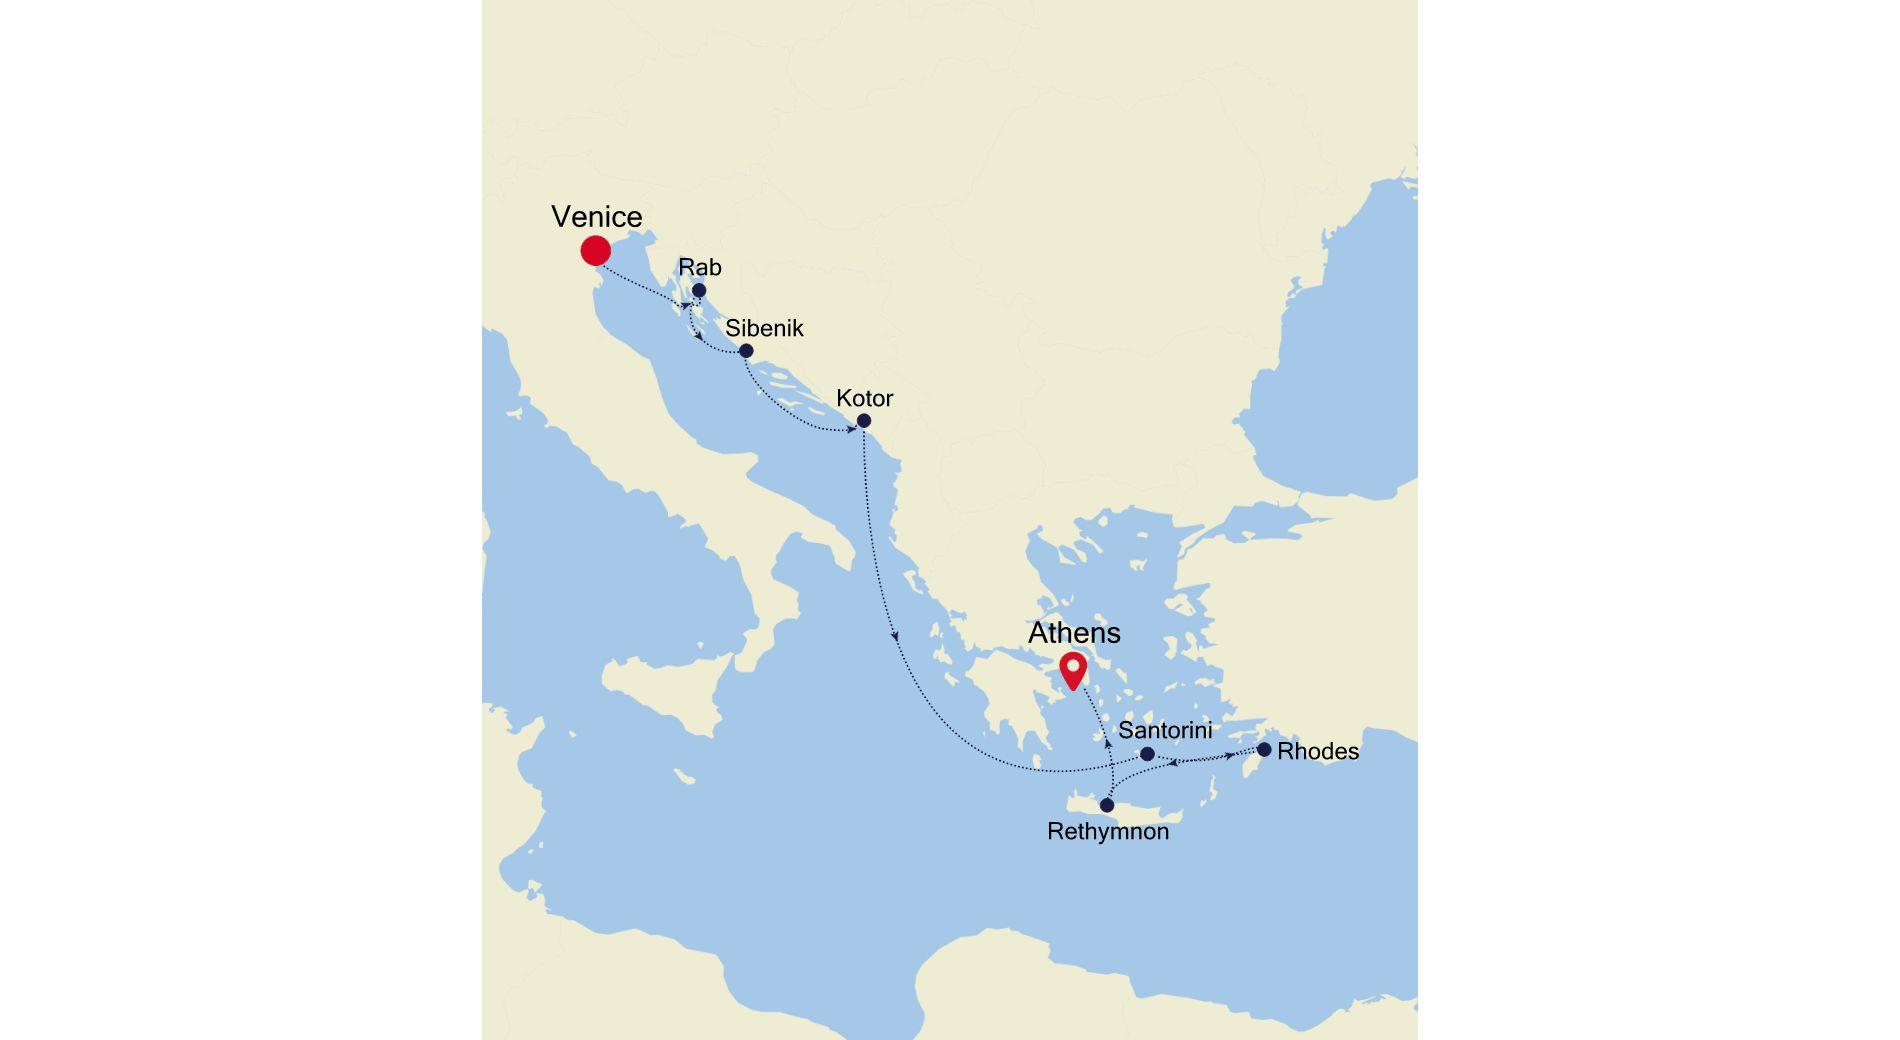 WH200819009 - Venice nach Athens